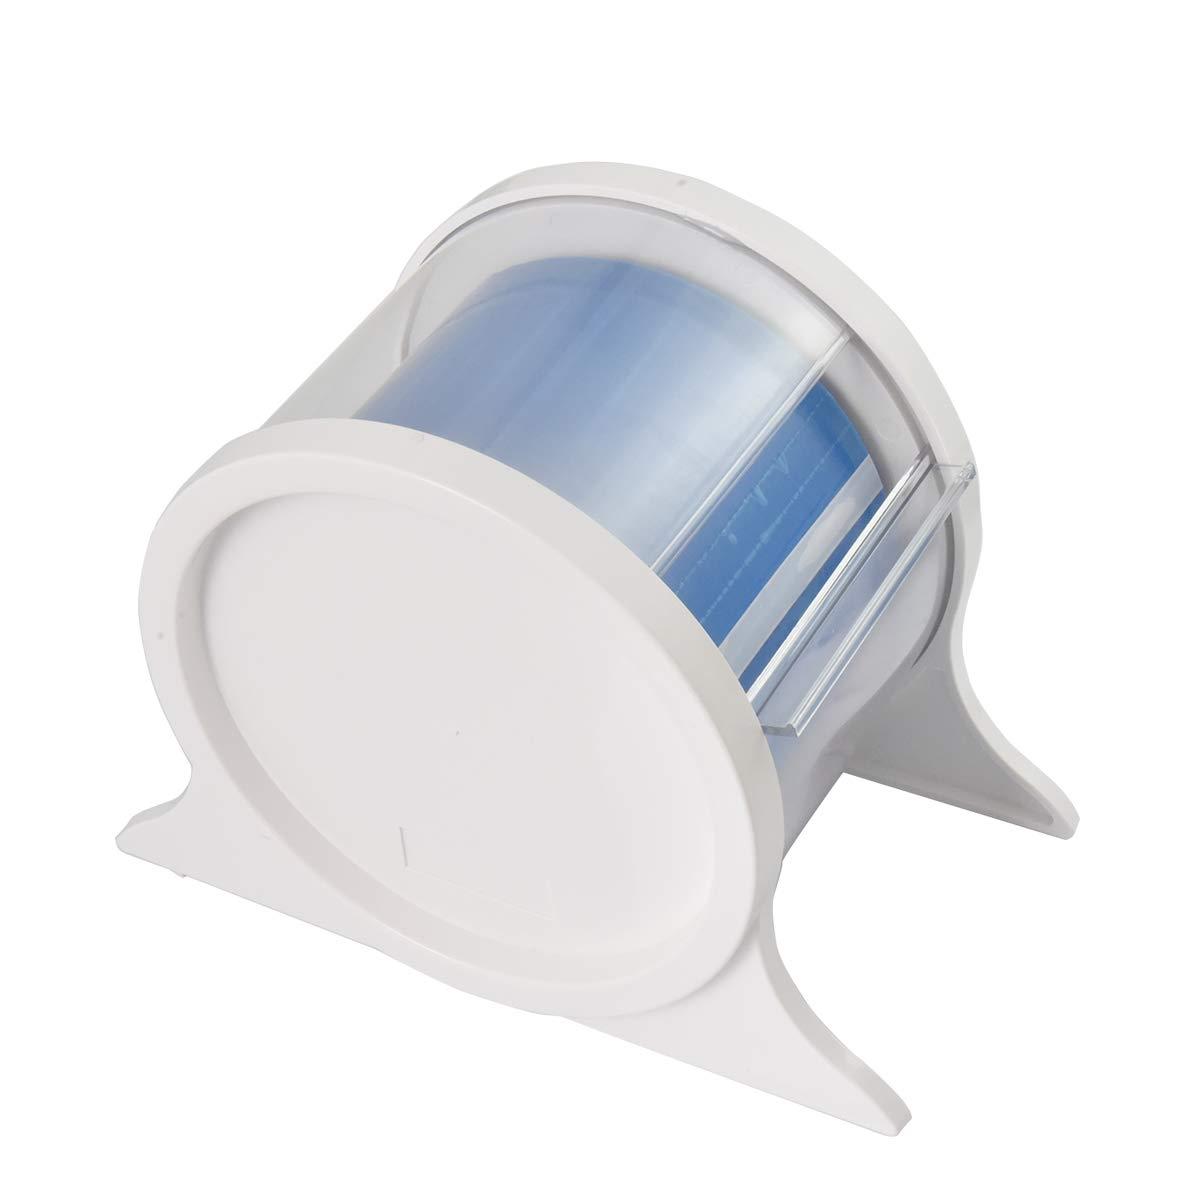 Dental Barrier Film Acrylic Dispenser Protecting Barrier Film Dispenser Box Dental Barrier Dispensers Plastic Stand Holder by Anhuadental